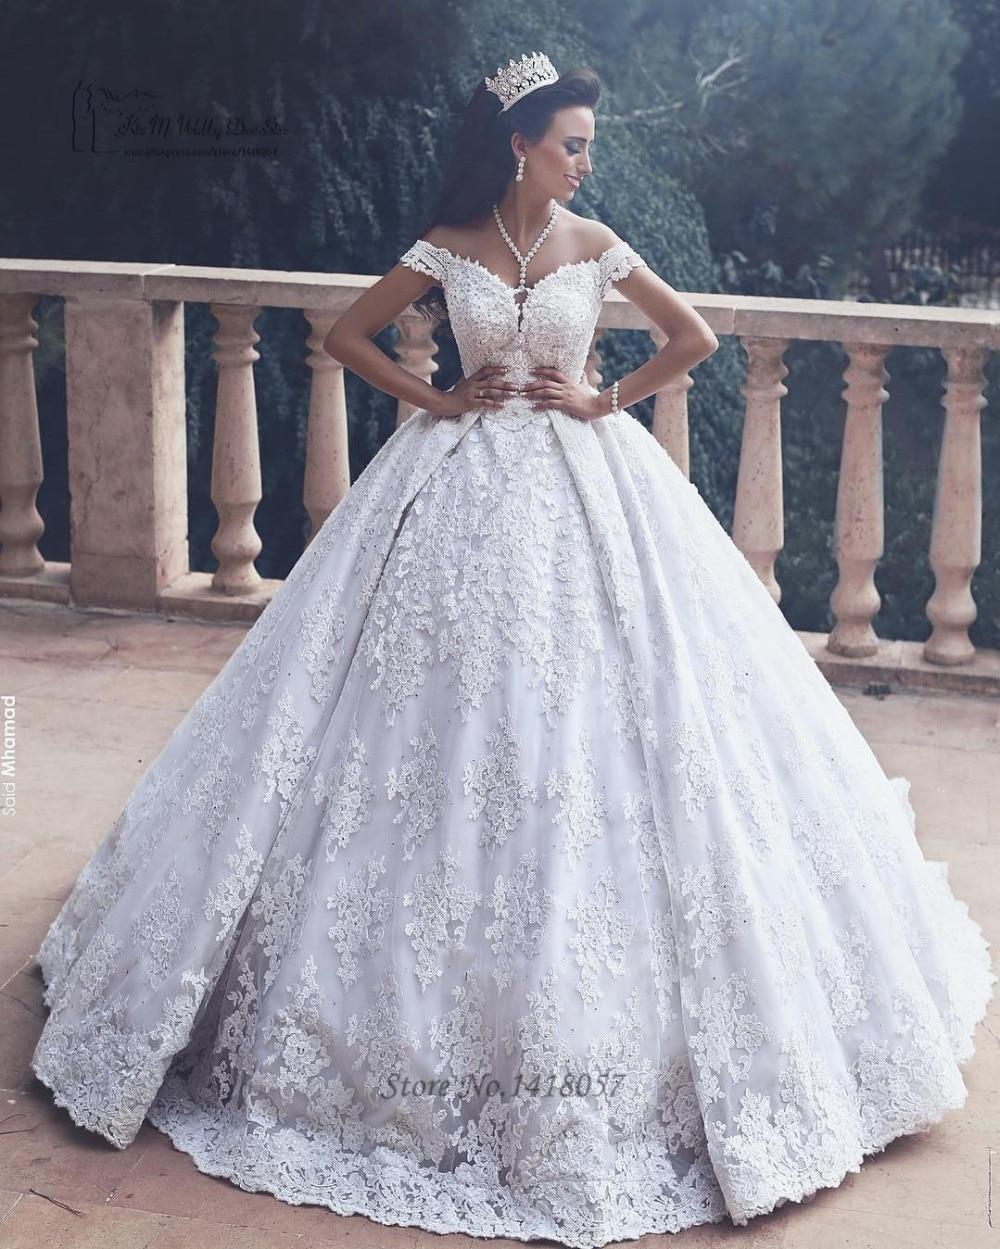 Luxury Dubai Wedding Dresses Turkey Ball Gown Bride Dress Lace ...